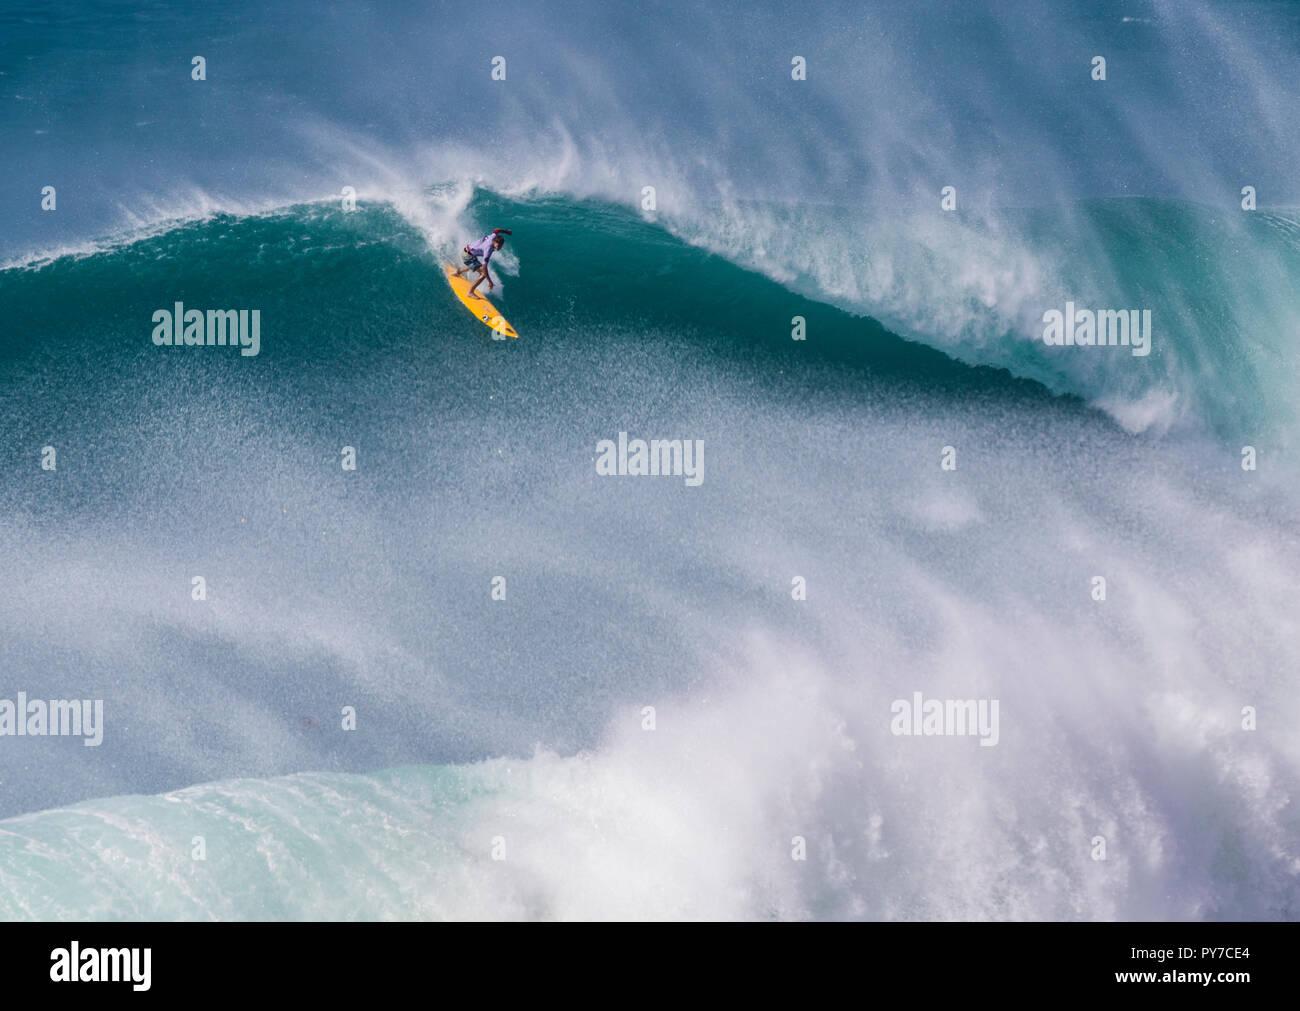 Mark Healey all'2016 Eddie Aikau surf contest. Immagini Stock